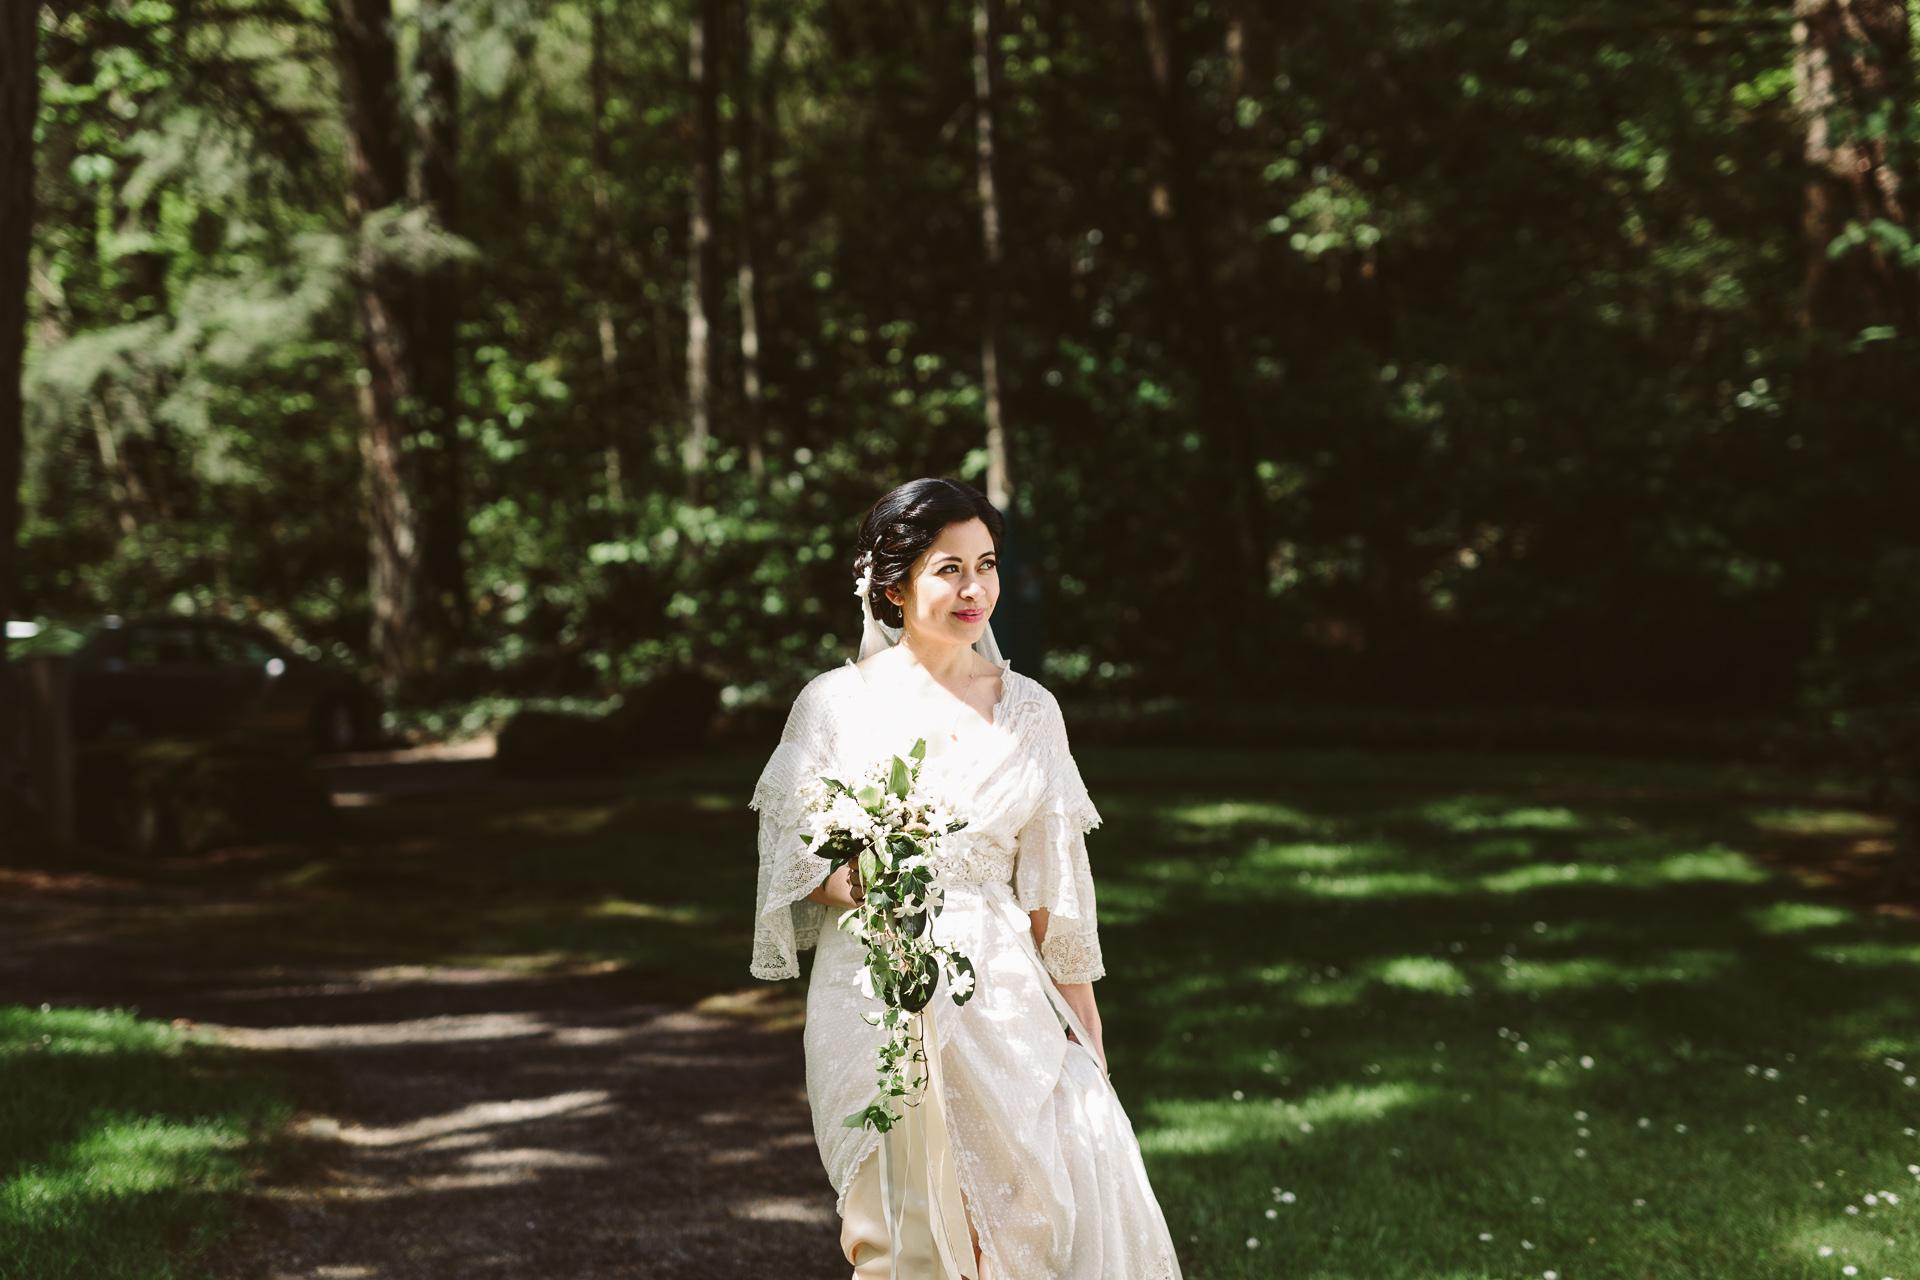 intimate-wedding-portland-oregon-jess-hunter-photography-0434.jpg